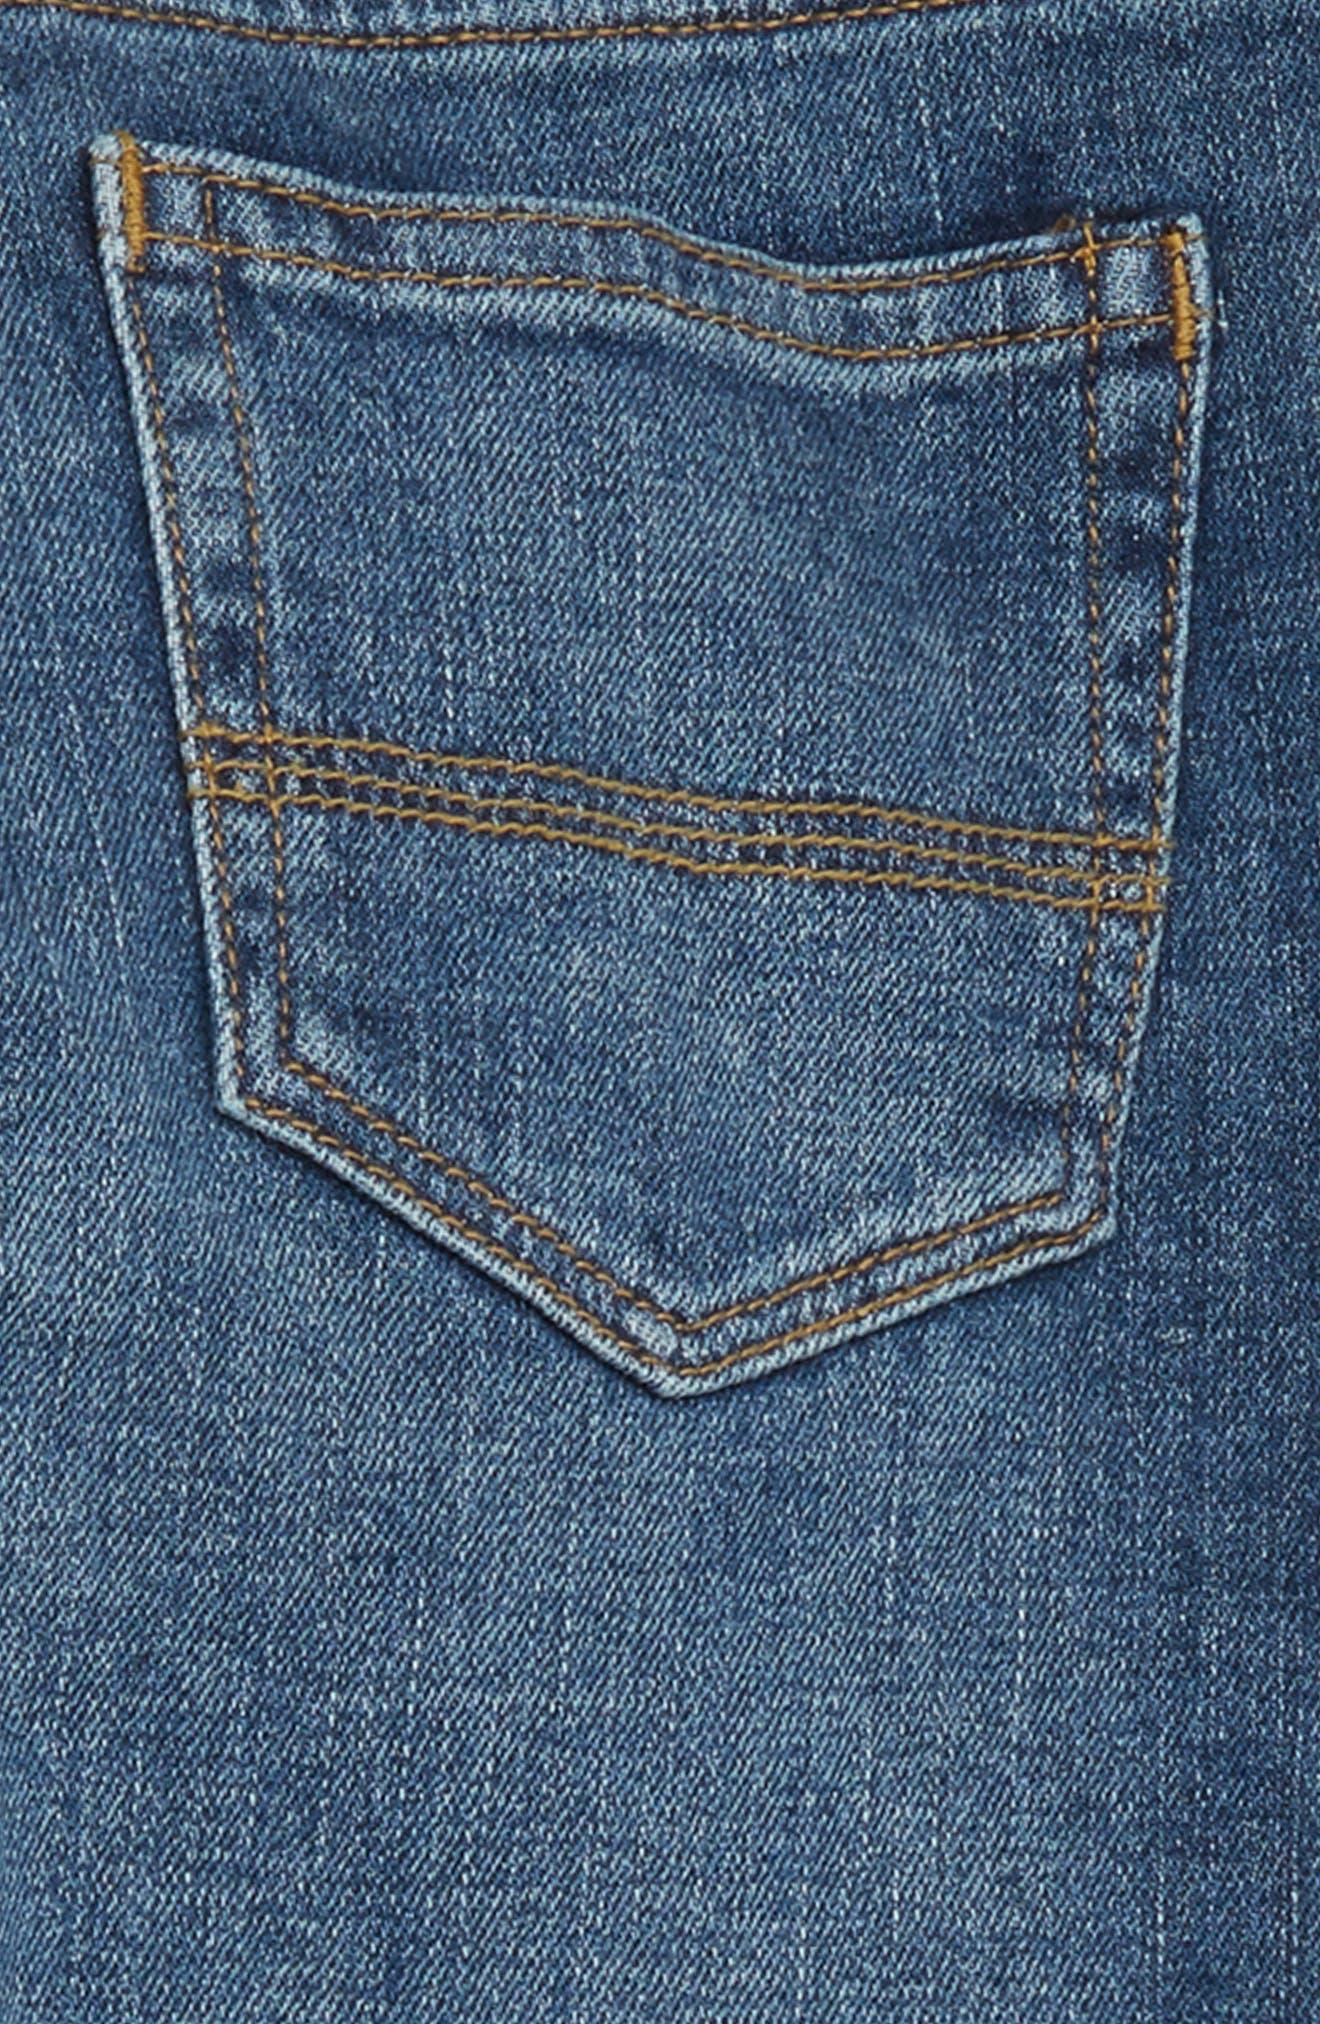 Slouch Jeans,                             Alternate thumbnail 3, color,                             MEDIUM WASH